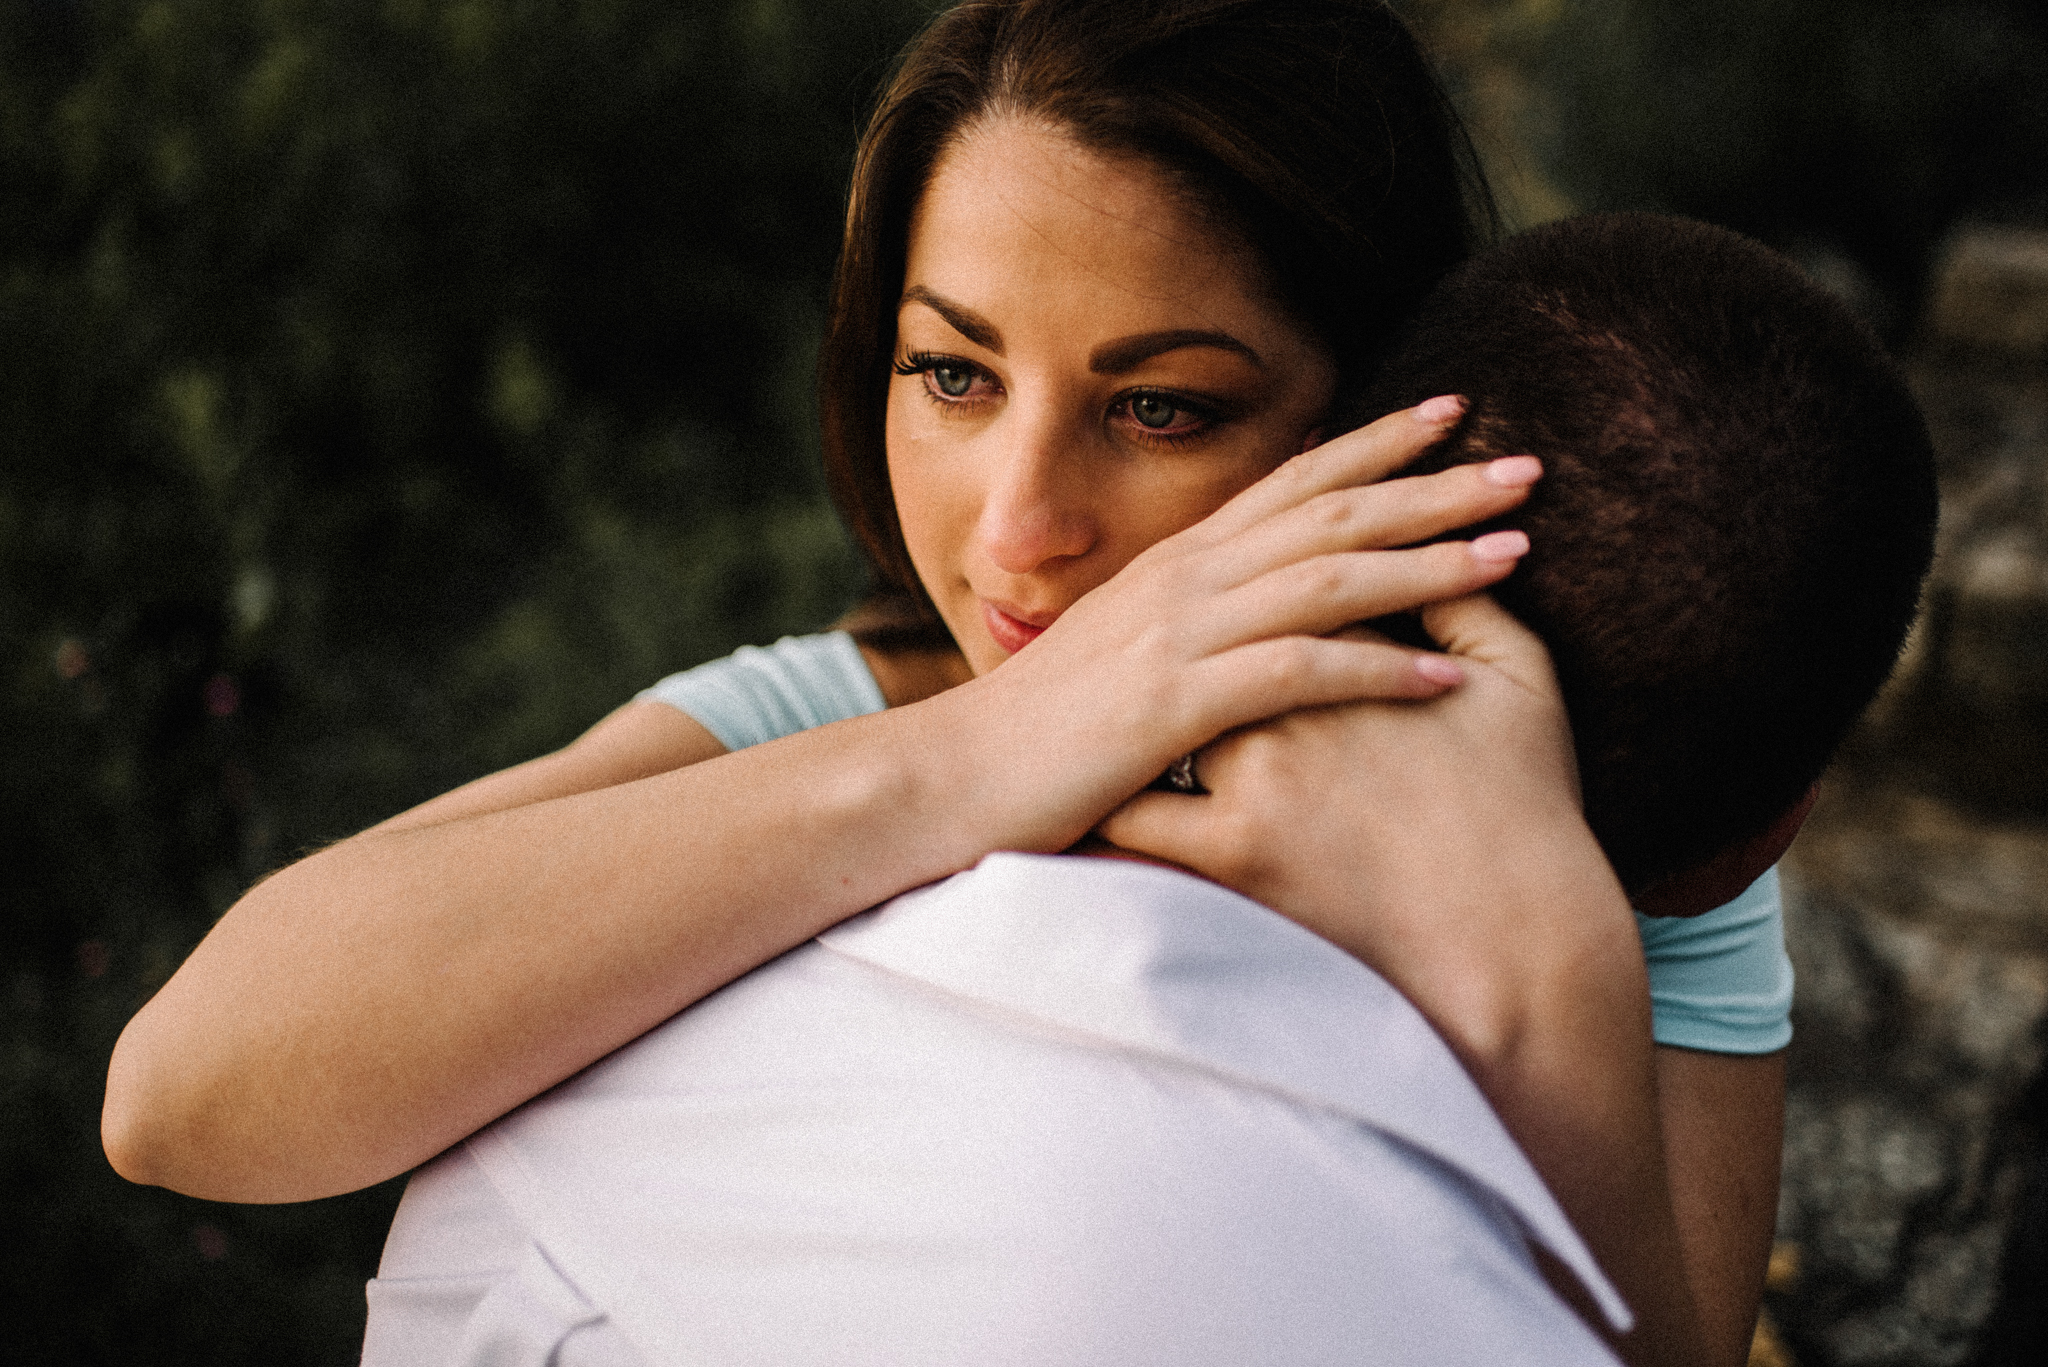 Mandy Spencer Maternity Sunrise Session Shenandoah National Park - White Sails Photography Creative_14.JPG